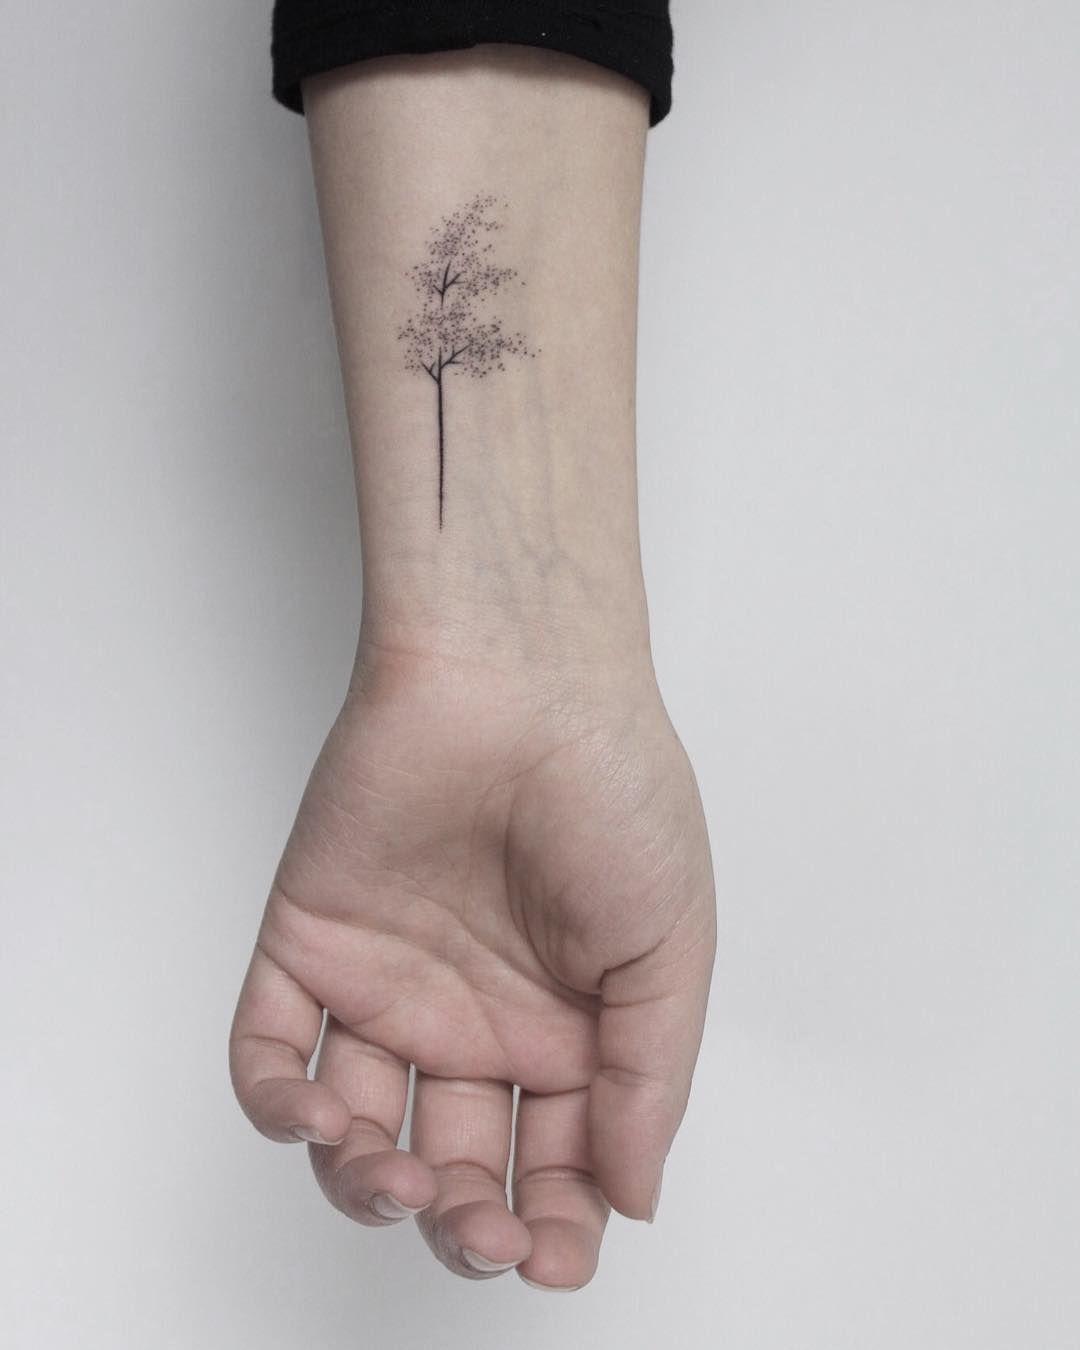 Pin by chelsea mcadam on tattoo ideas tiny tree tattoo